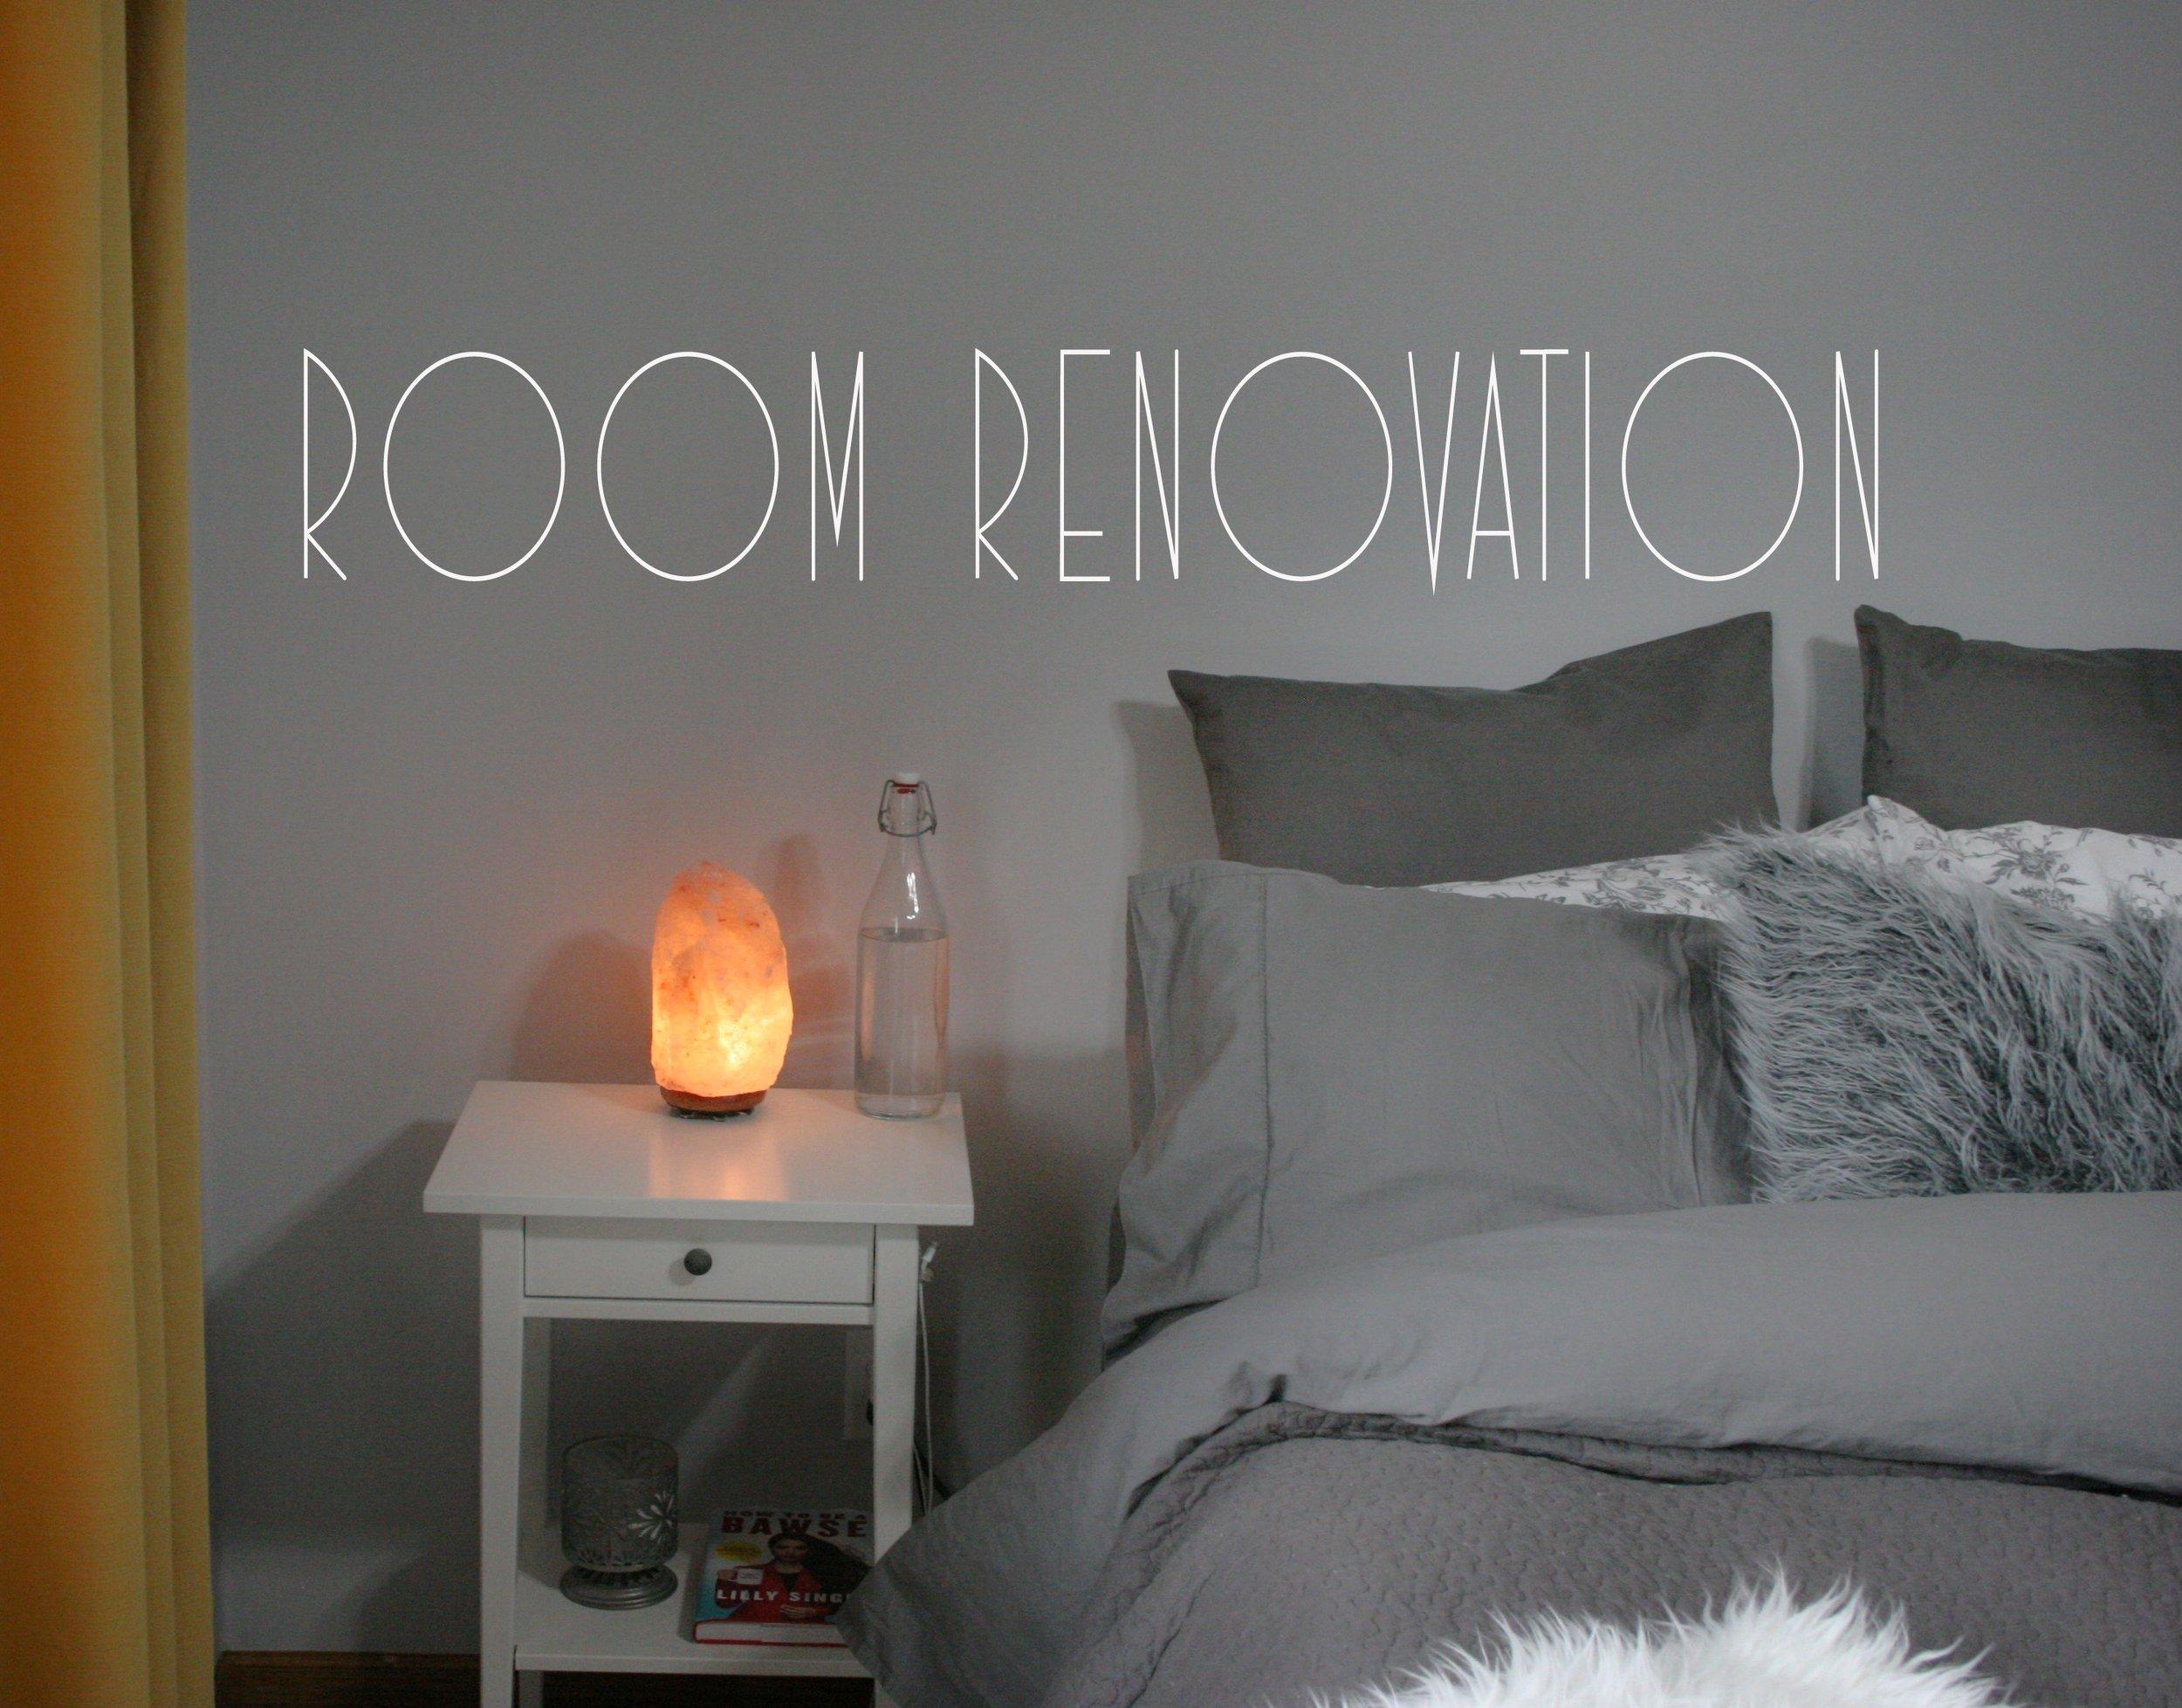 room-renovation-done.jpg